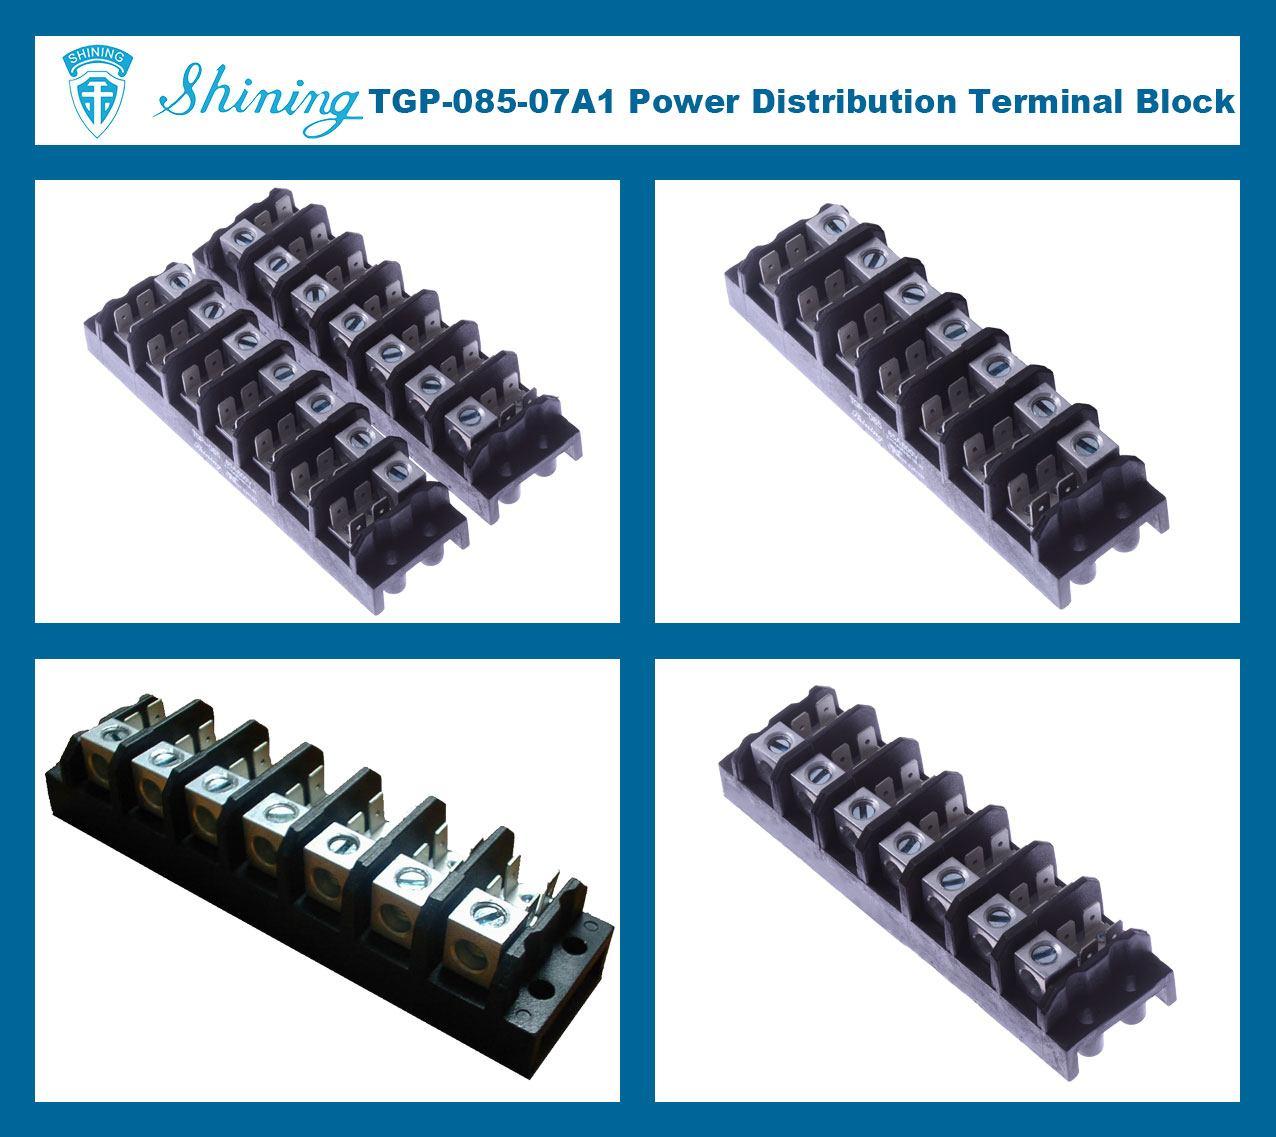 TGP-085-07A1 600V 85A 7 Pole Electrical Power Terminal Block